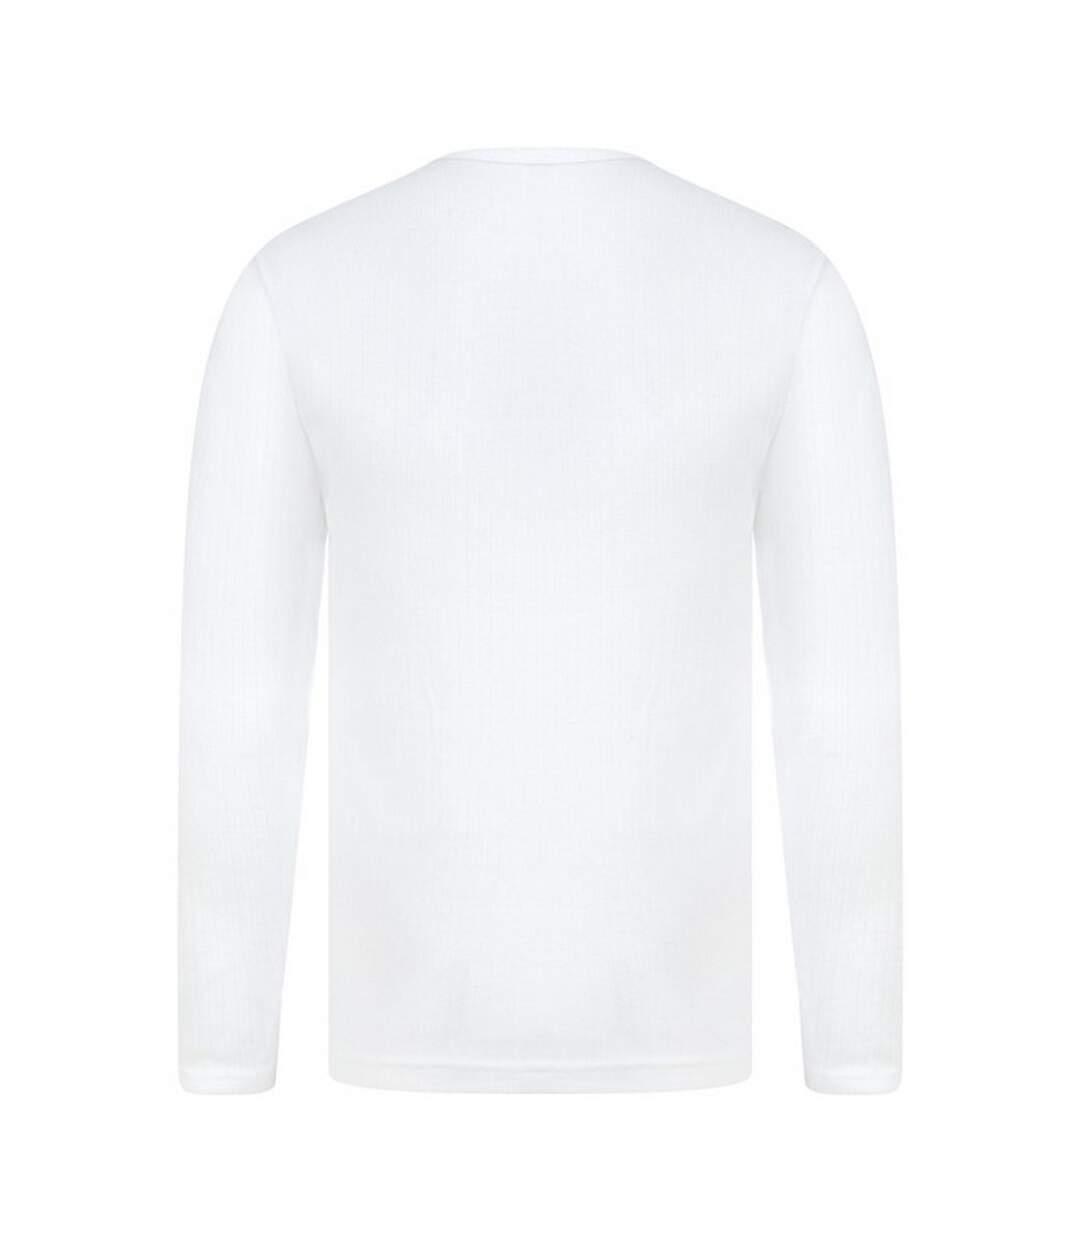 Absolute Apparel - T-shirt thermique - Homme (Blanc) - UTAB122